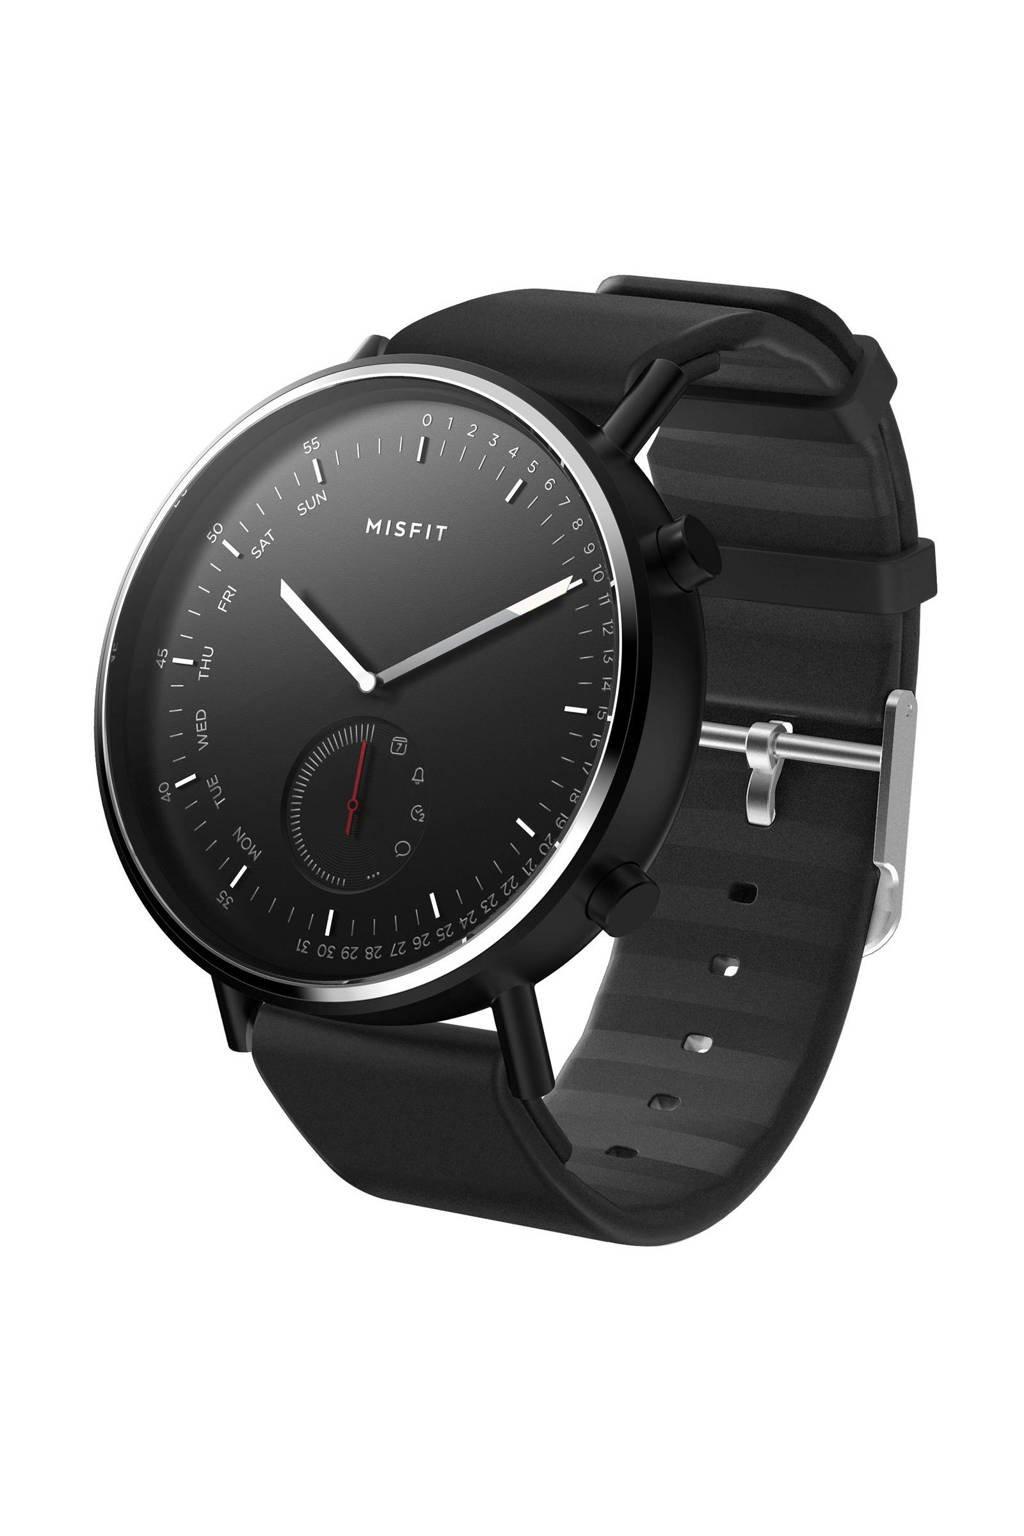 Misfit hybrid smartwatch Mammoth MIS5017, Zwart